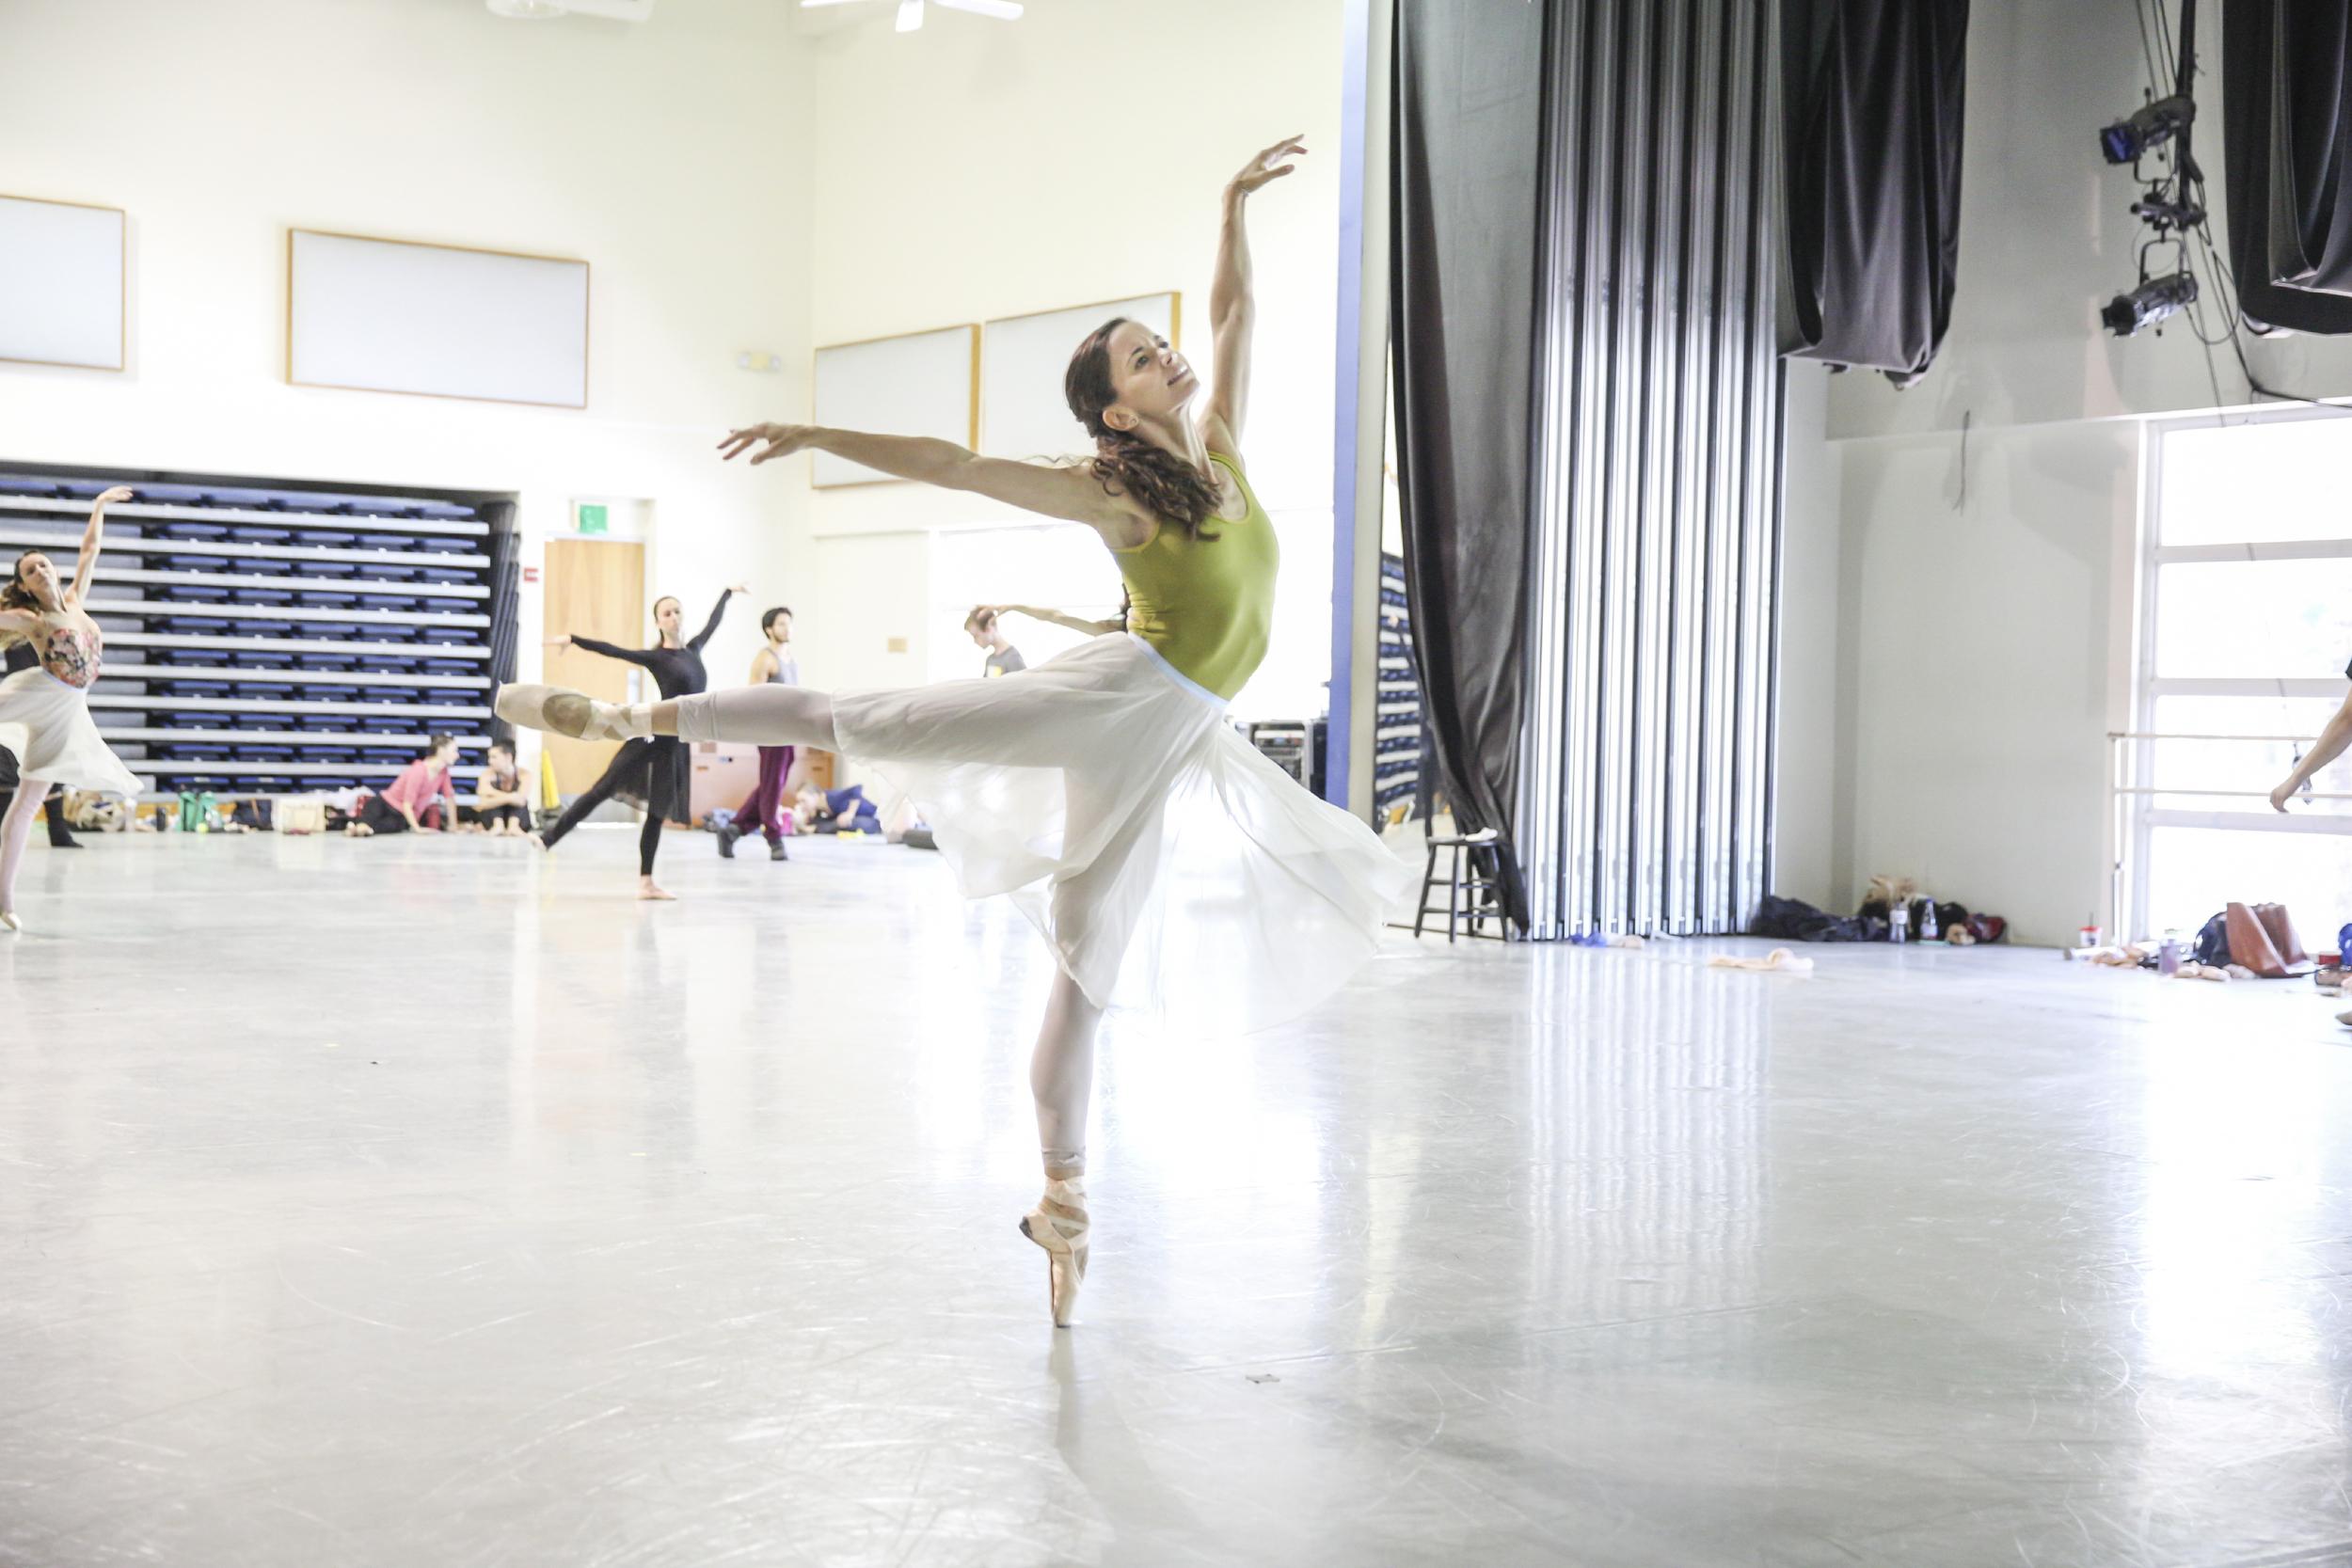 MIAMI CITY BALLET DANCER EMILY BROMBERG REHEARSING   A MIDSUMMER NIGHT'S DREAM |  PHOTOGRAPH BY DANIEL   AZOULAY